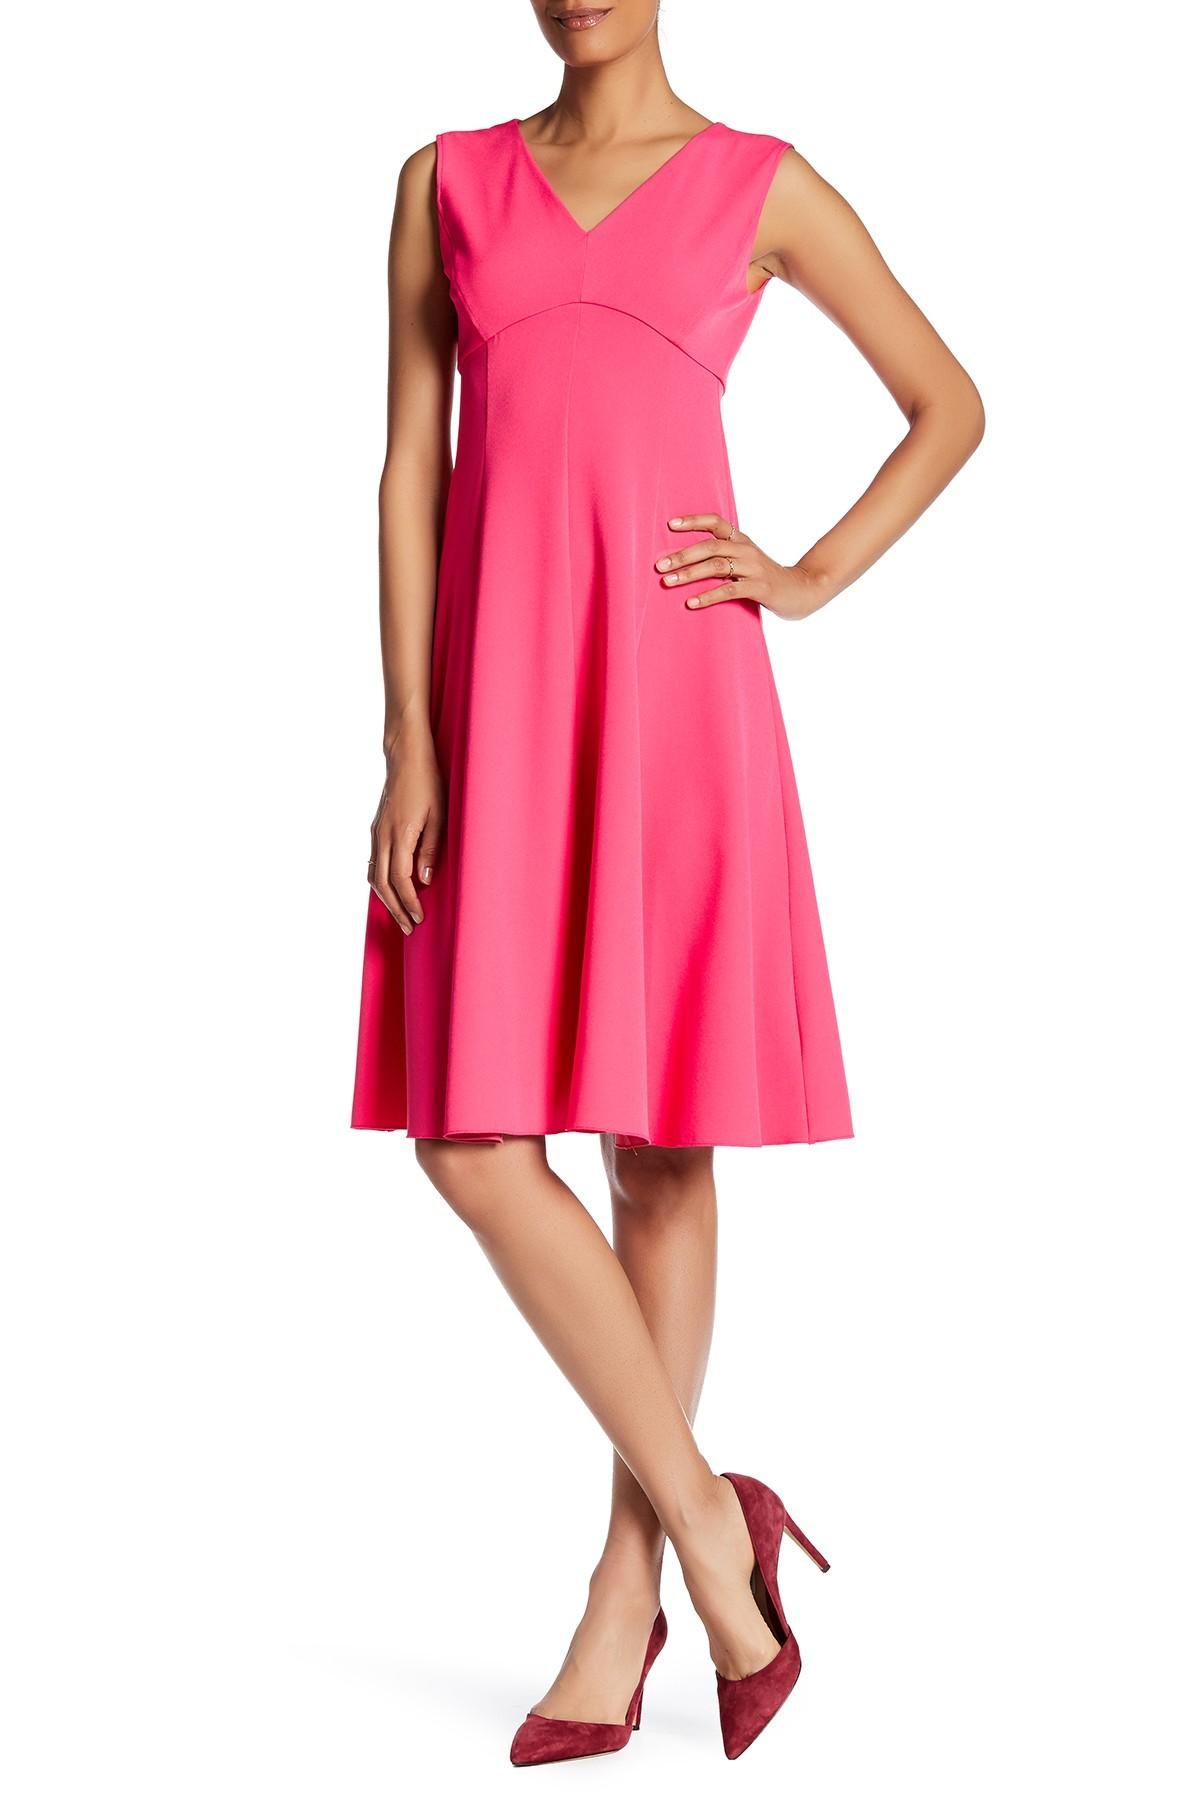 Lands End Empire Waist Midi Dress In Pink Lyst